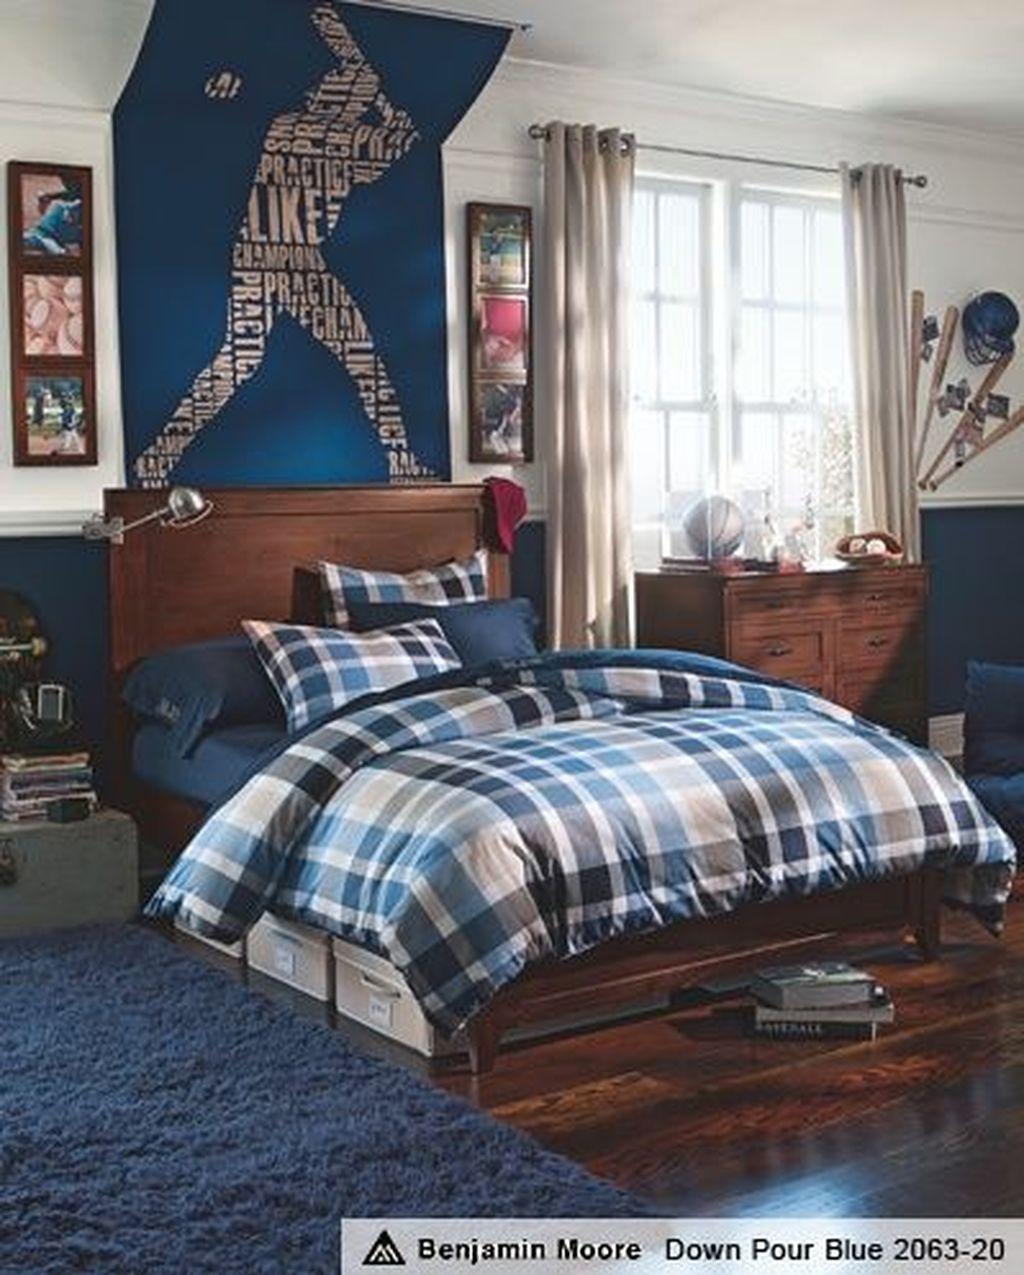 49 fabulous sport bedroom ideas for boys bedroom boys bedroom rh pinterest com